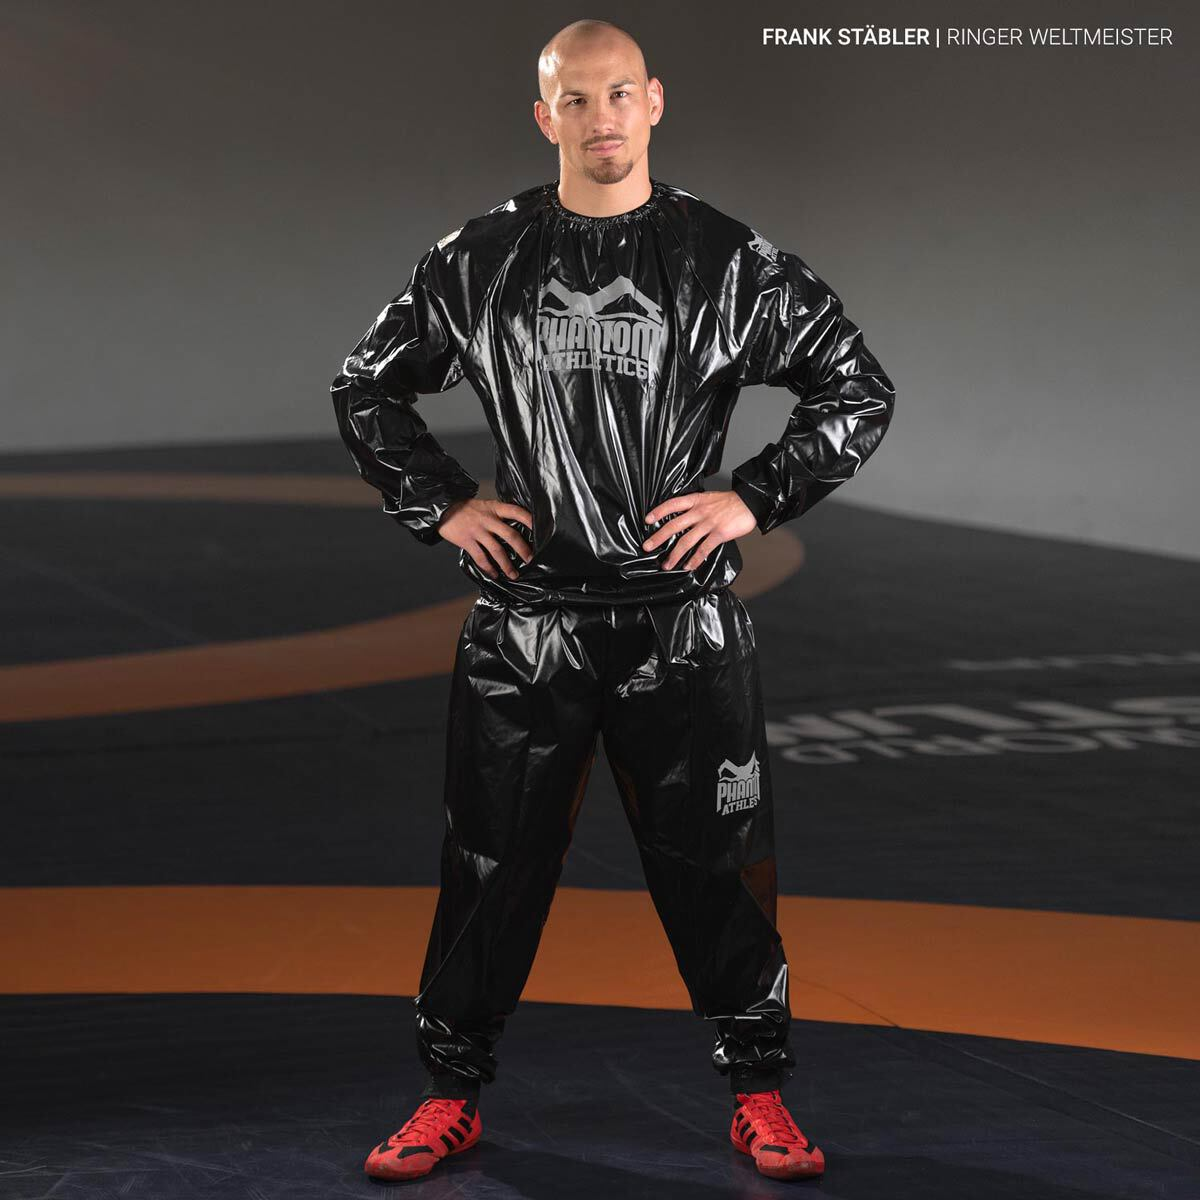 L-3XL Schwitzanzug Saunaanzug Sauna Suit Anzug Sweat Gewicht abnehmen Fitness